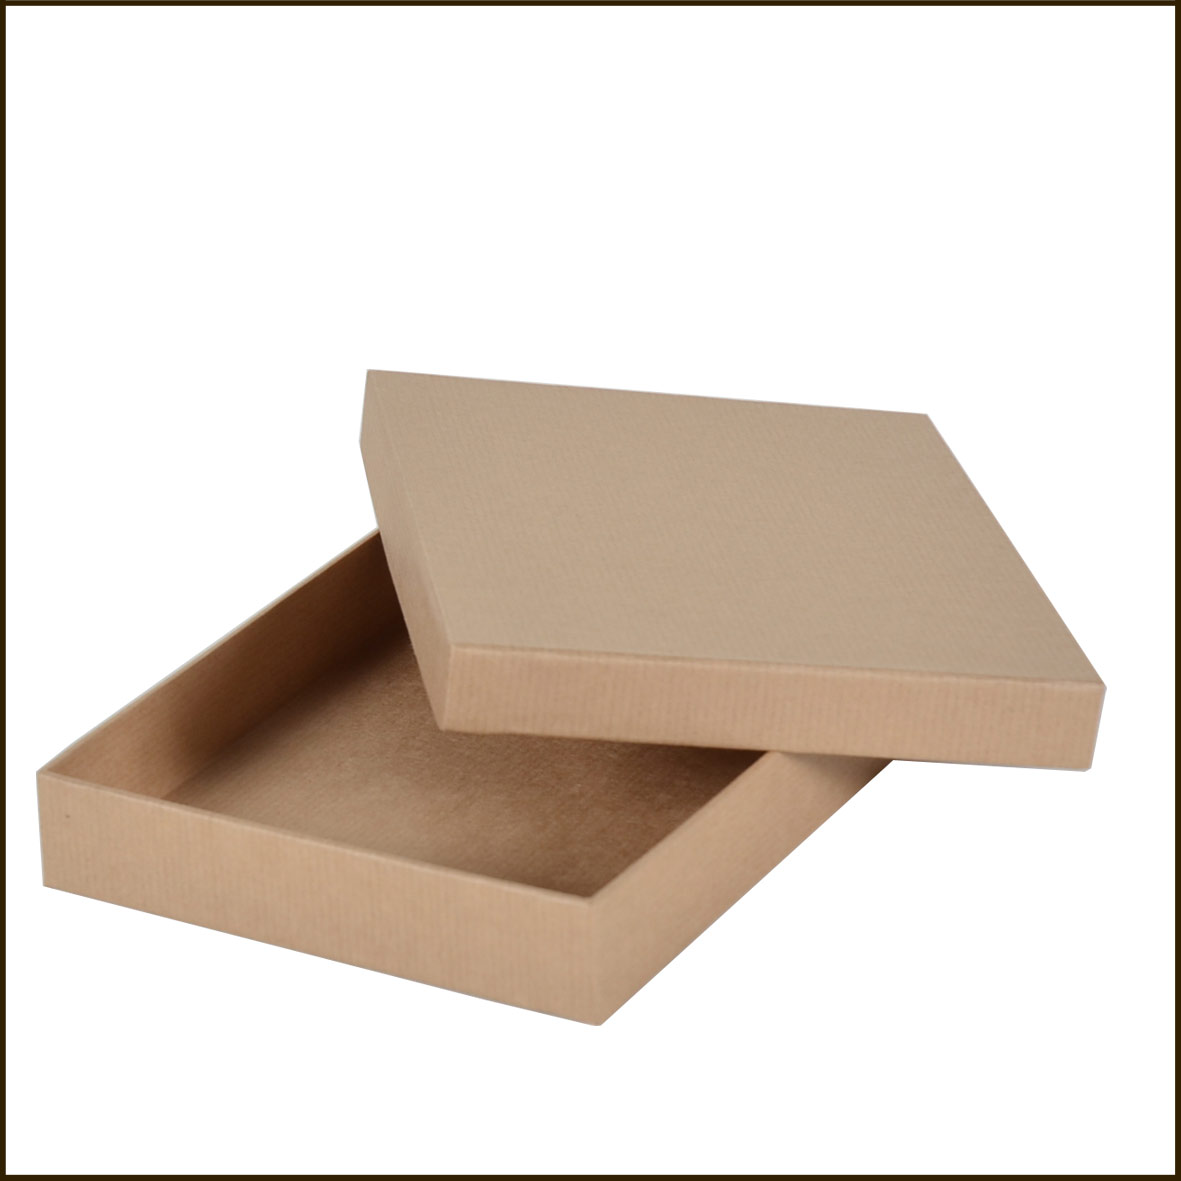 Cherche boites standard en papier / carton -250*250*50 mm environ.f